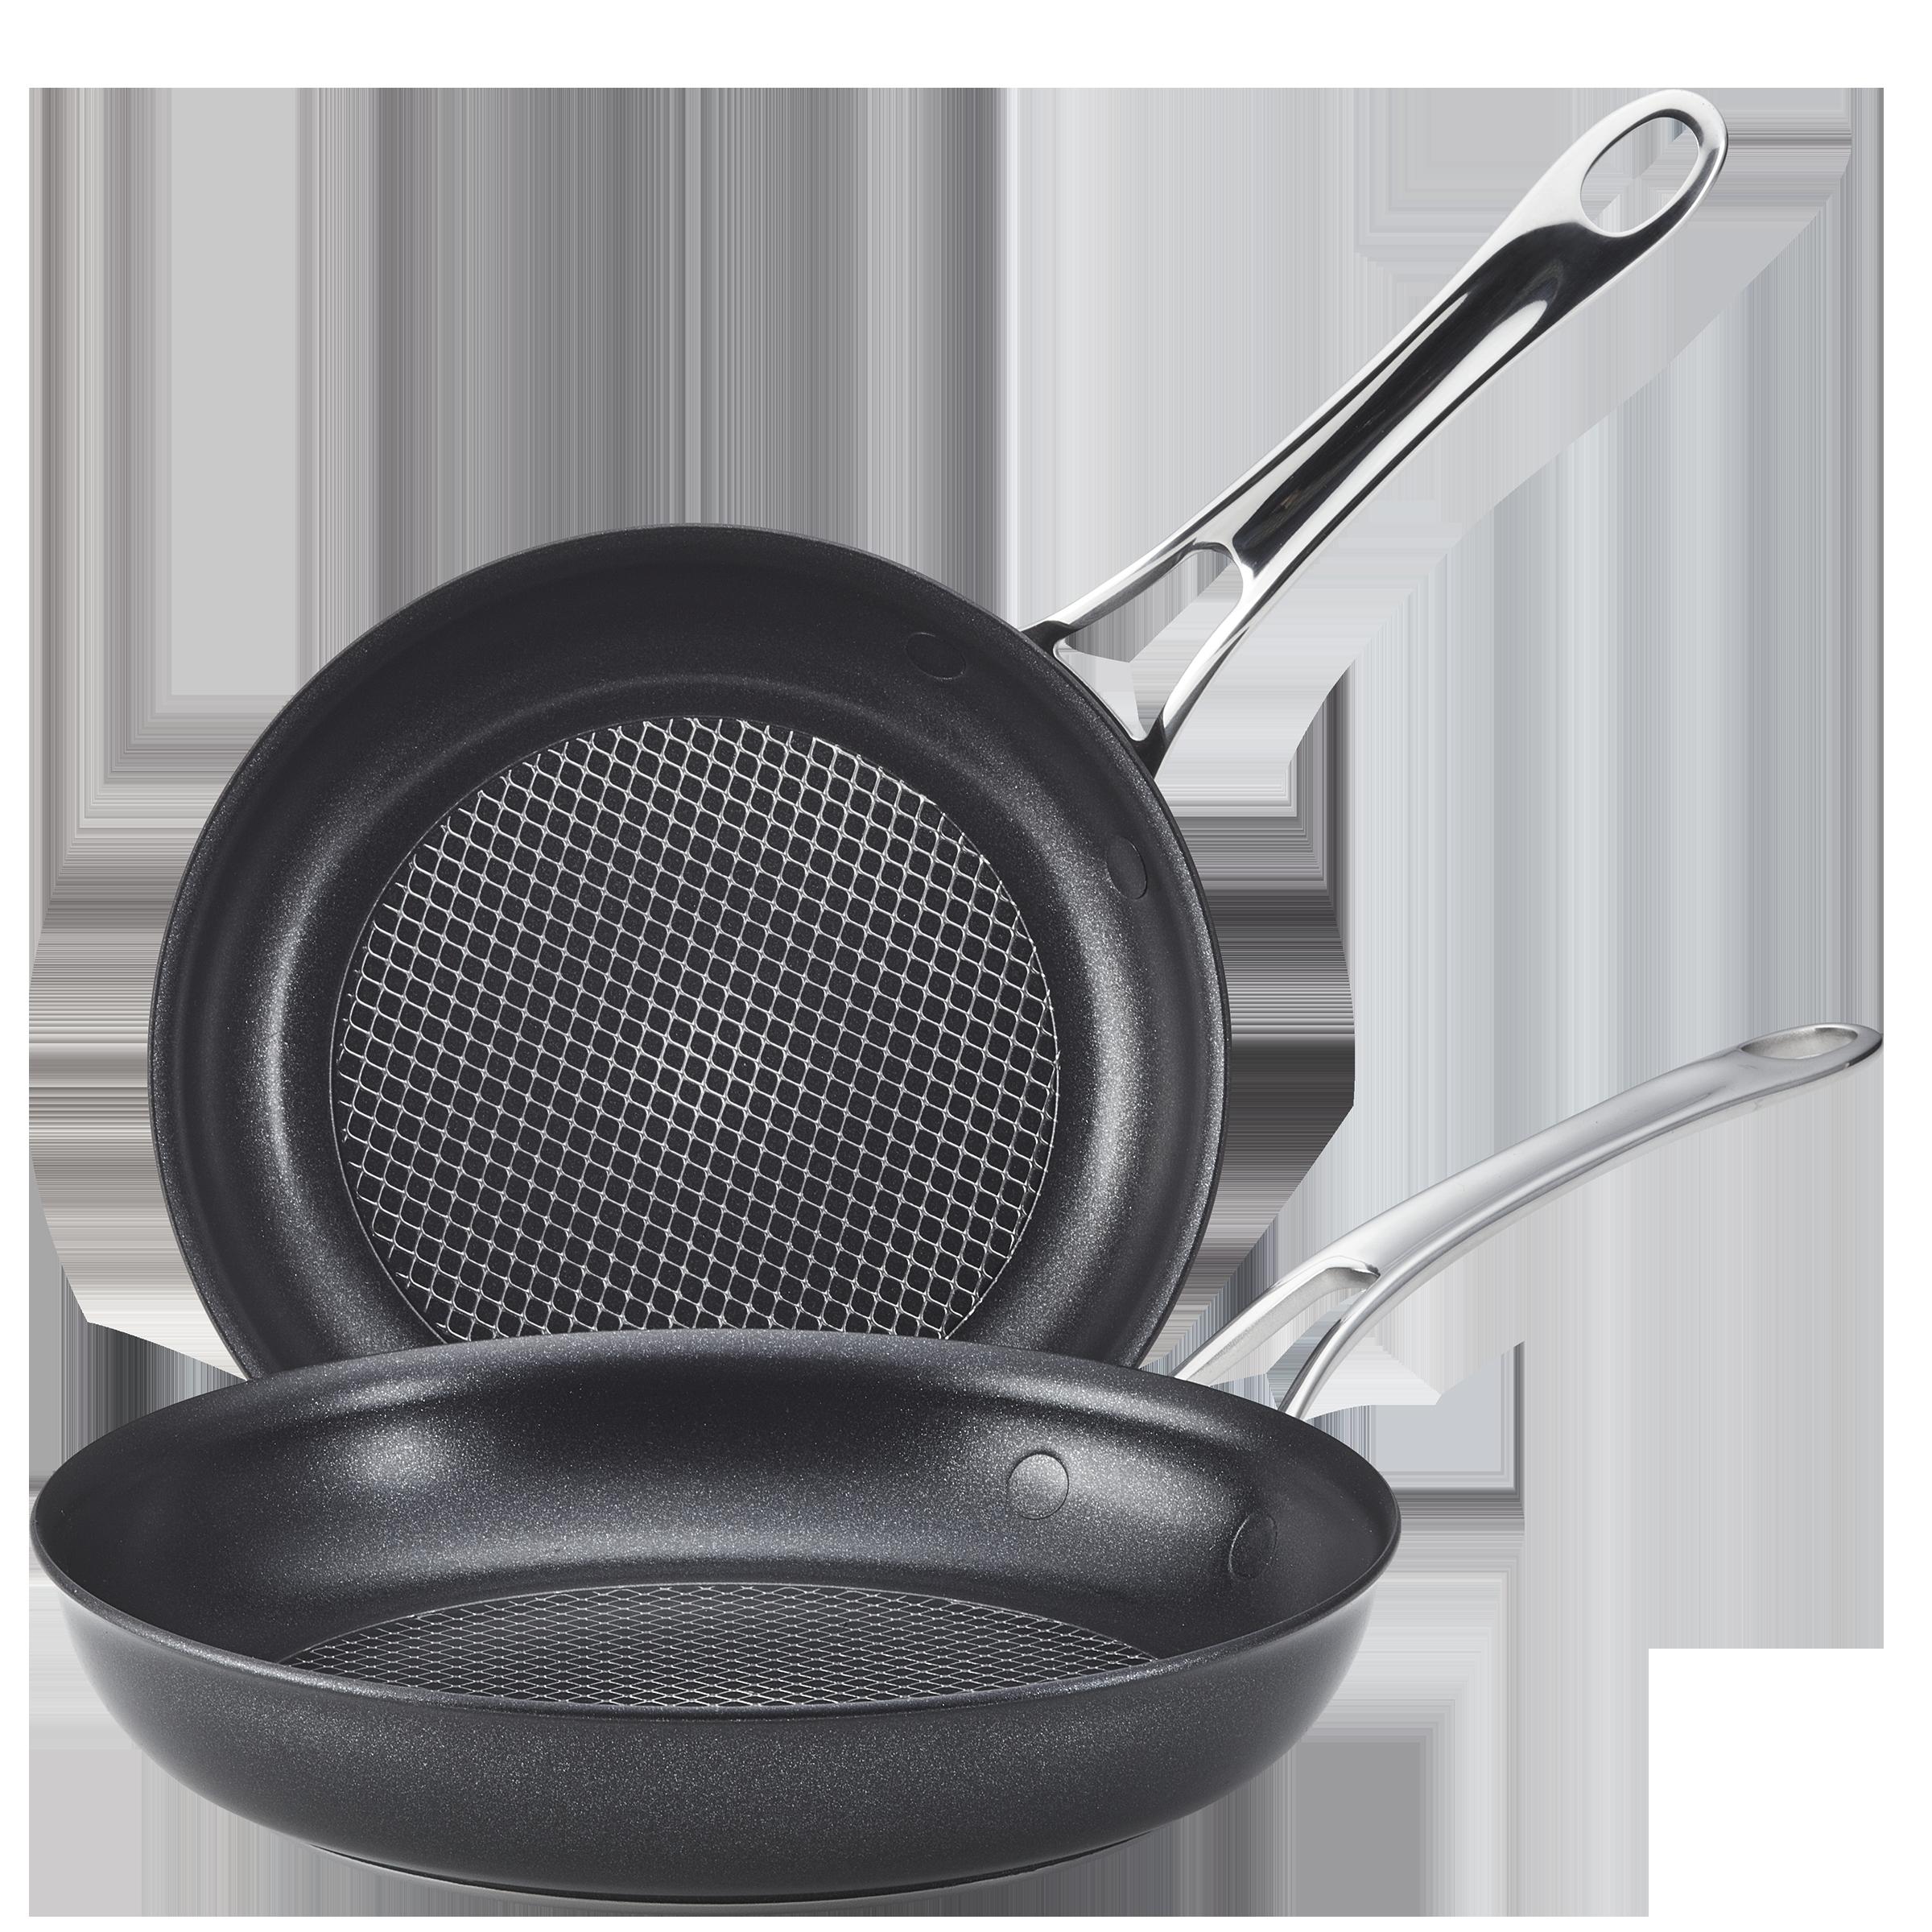 8.25 & 10-inch Frying Pan Set